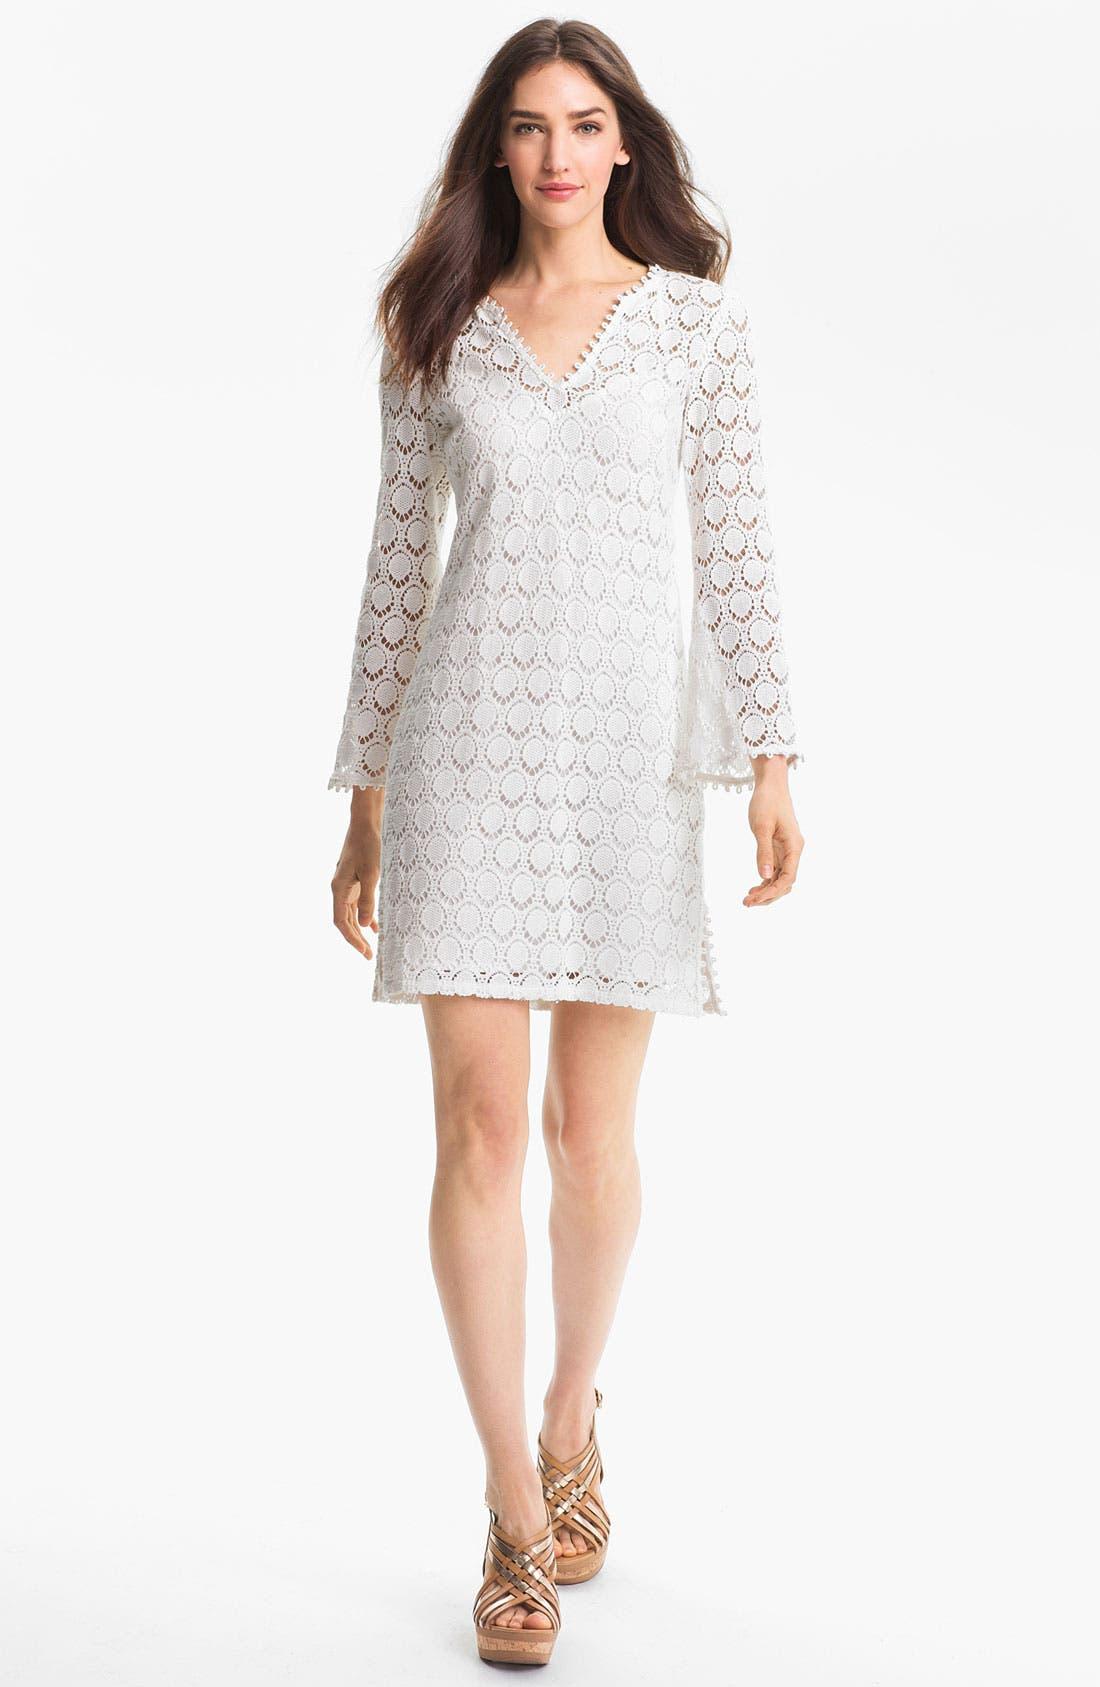 Main Image - Trina Turk 'Deep Sea' Lace Cotton Shift Dress